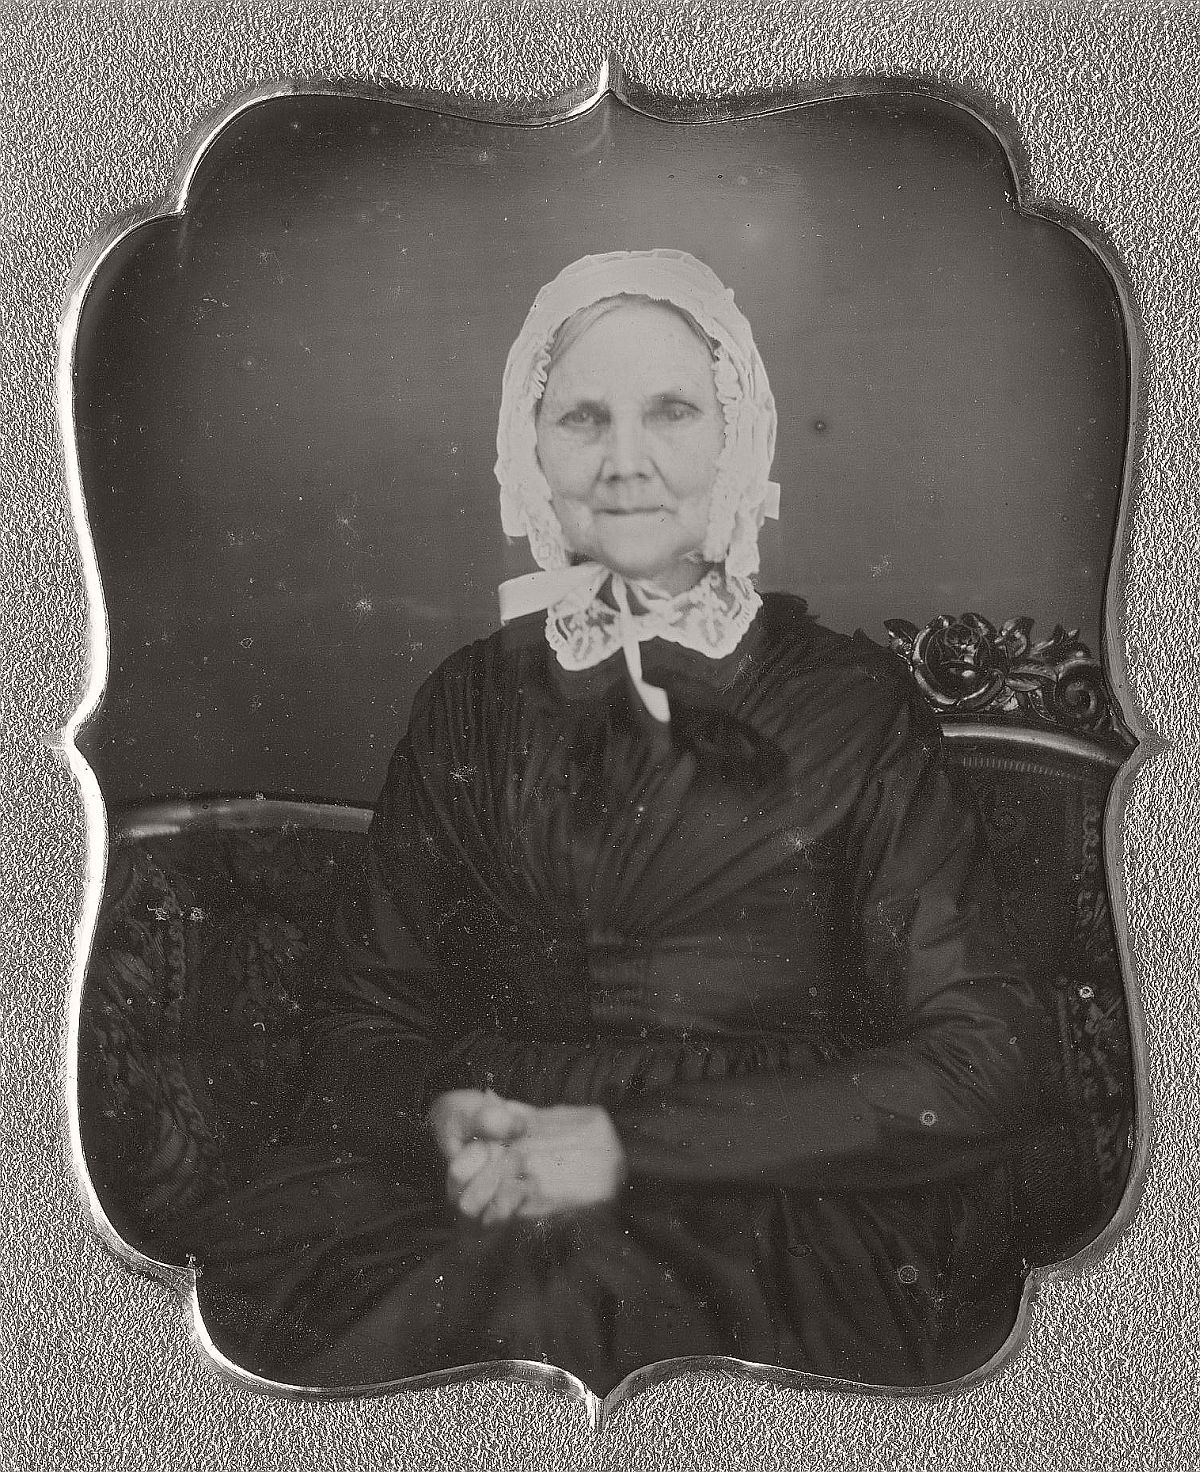 daguerreotype-portrait-people-born-in-the-late-18th-xviii-century-1700s-vintage-41